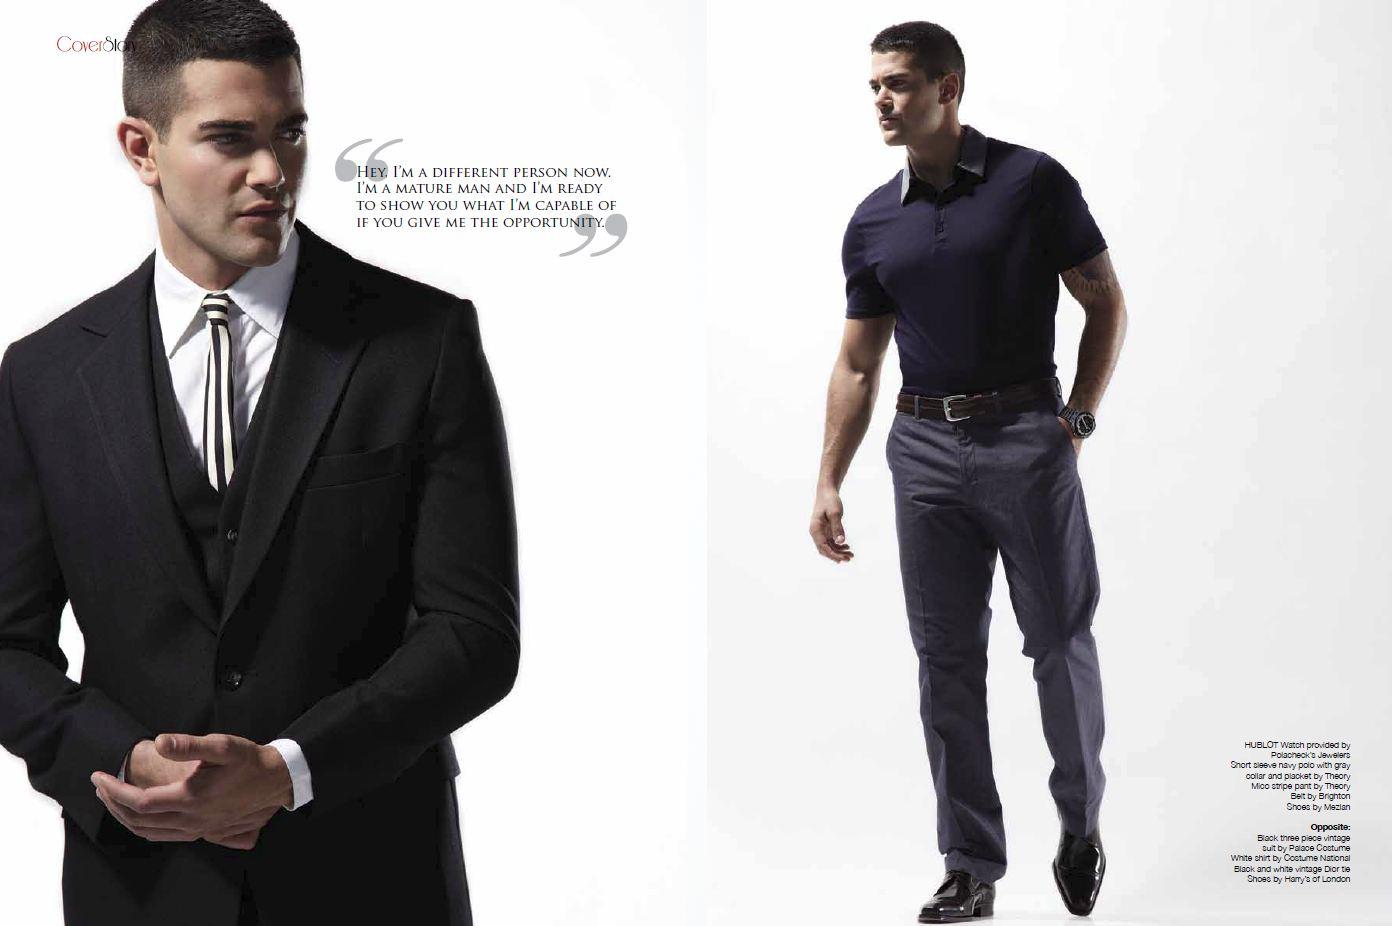 Jesse-Metcalfe-Westlake-Magazine-March-April-2011-002.jpg